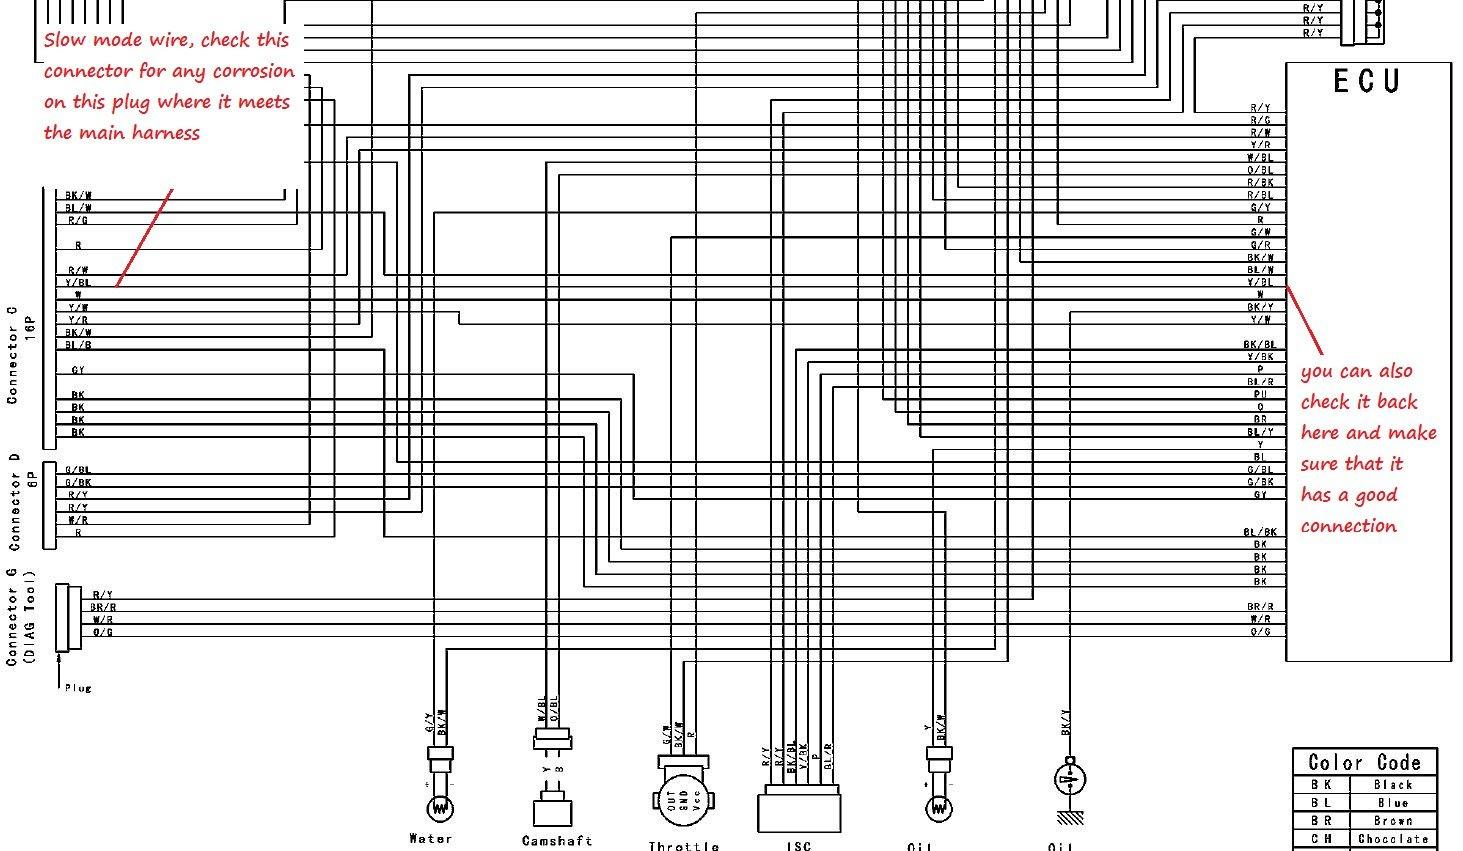 2001 Kawasaki Stx Jet Ski Wiring Diagram Wiring Diagram Lush Fast A Lush Fast A Lastanzadeltempo It